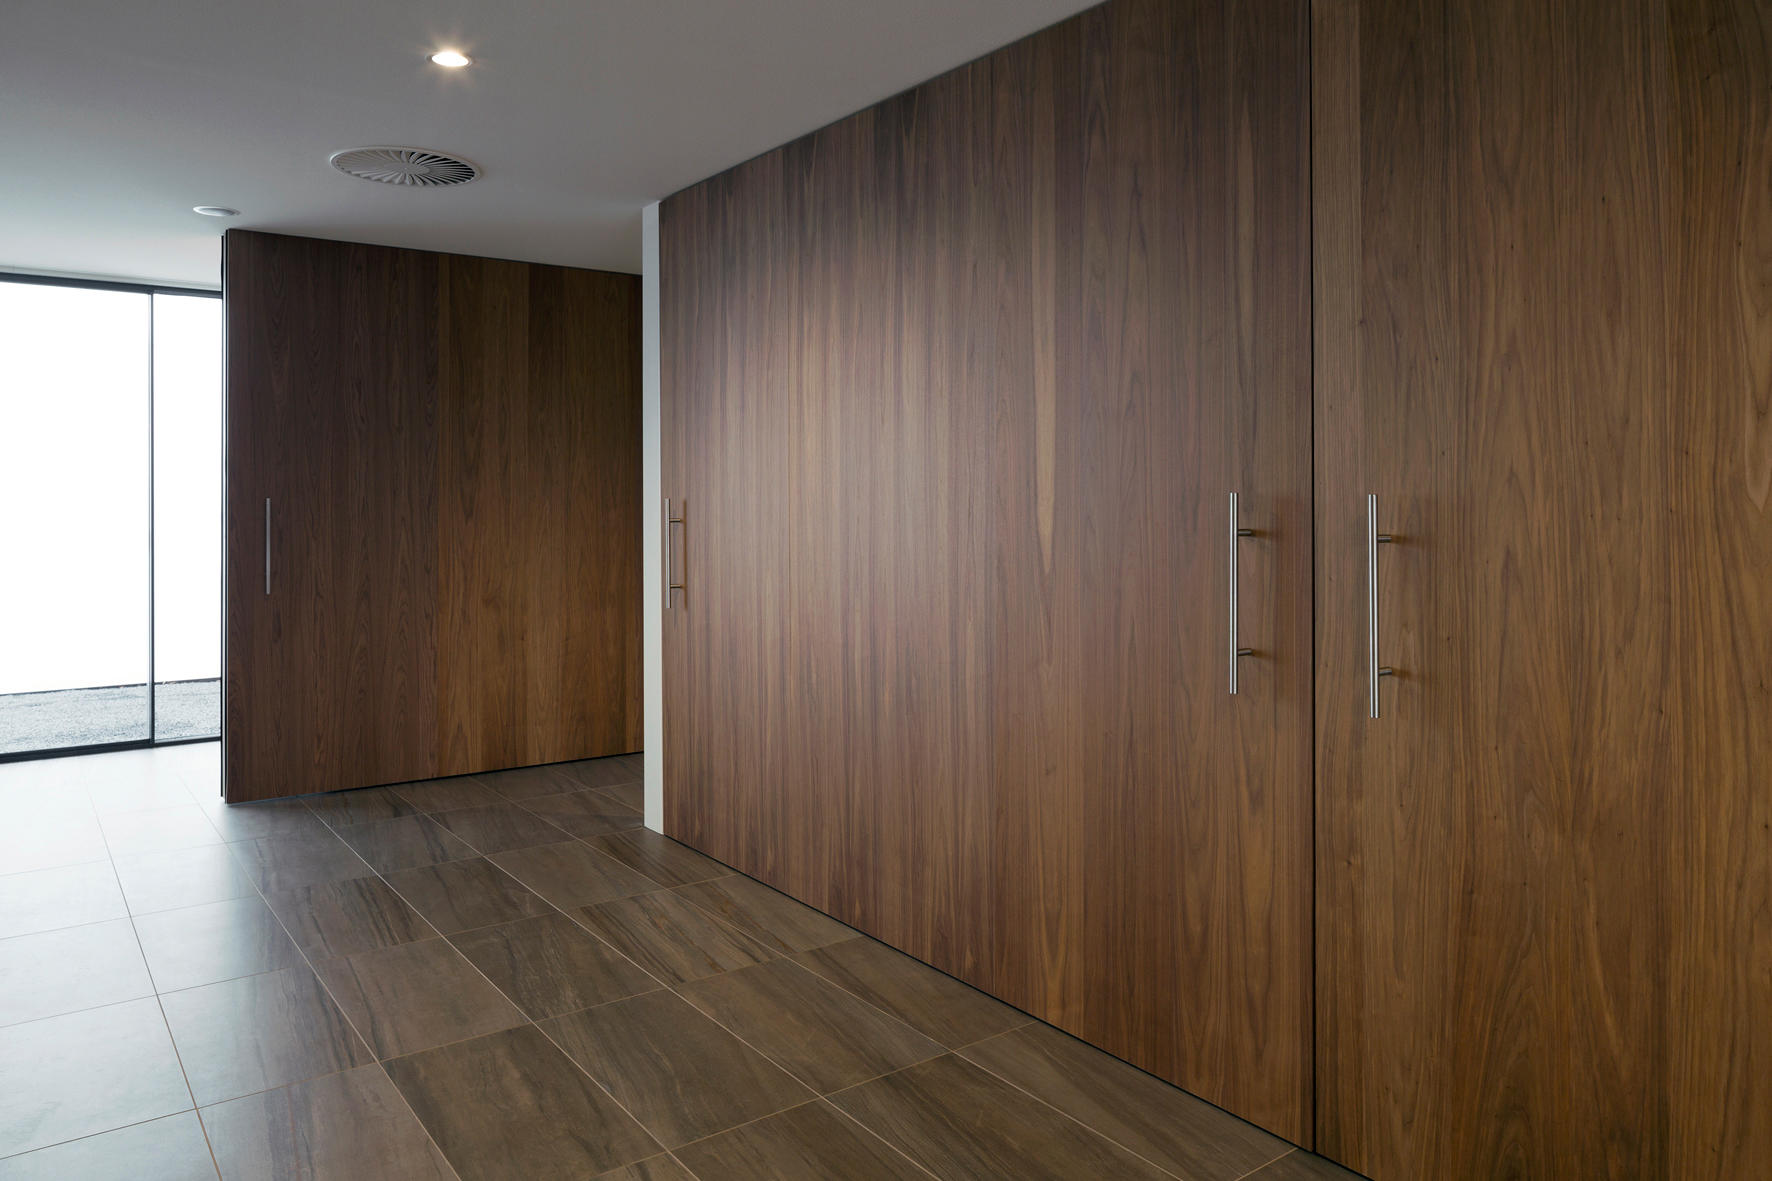 System 3 Big Wooden Pivot Door Hinges From